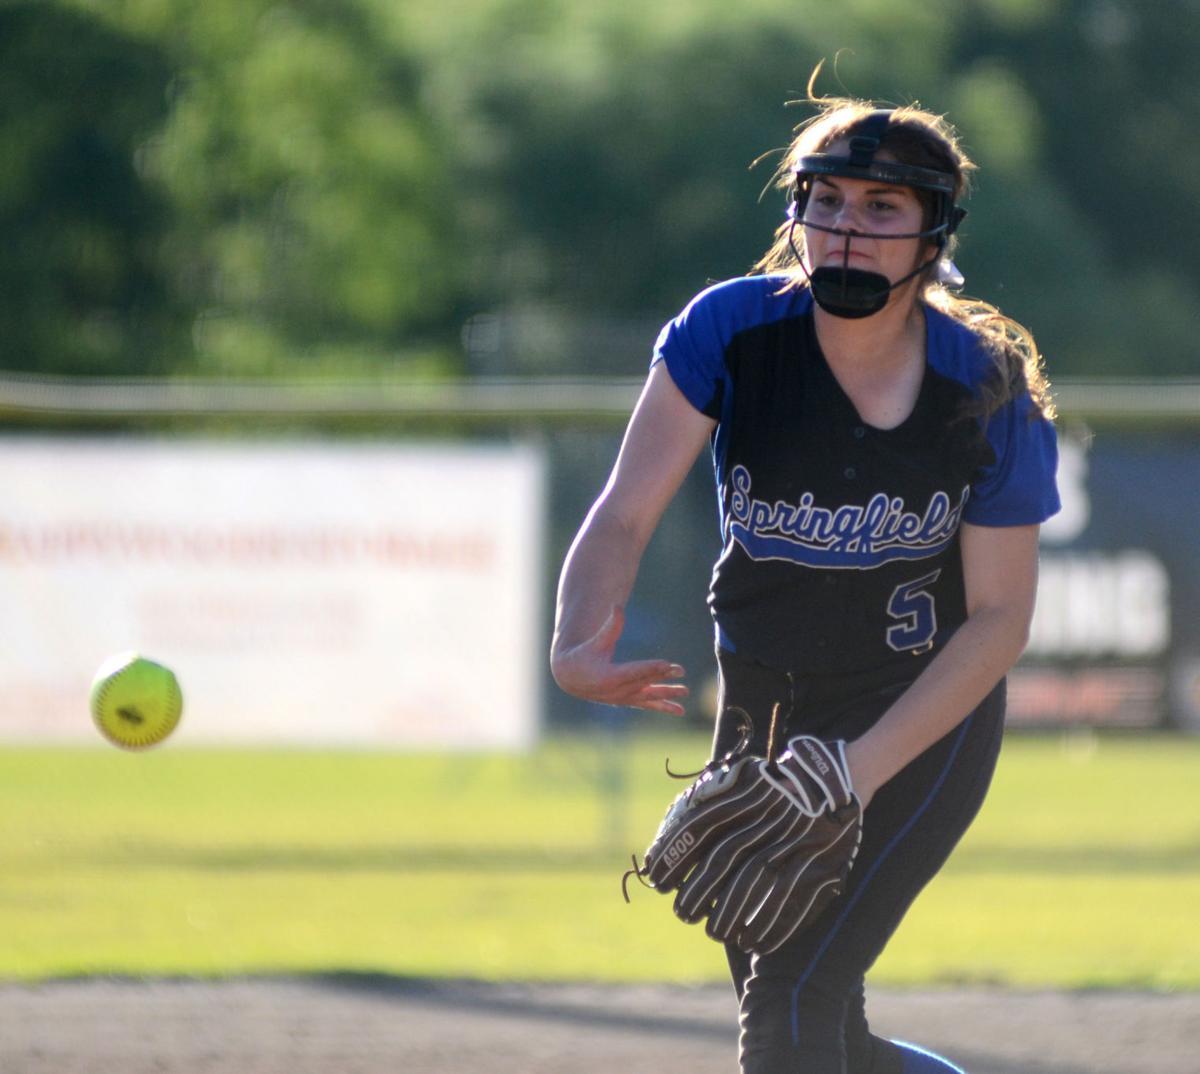 Springfield-Port Allen softball Morgan Sibley